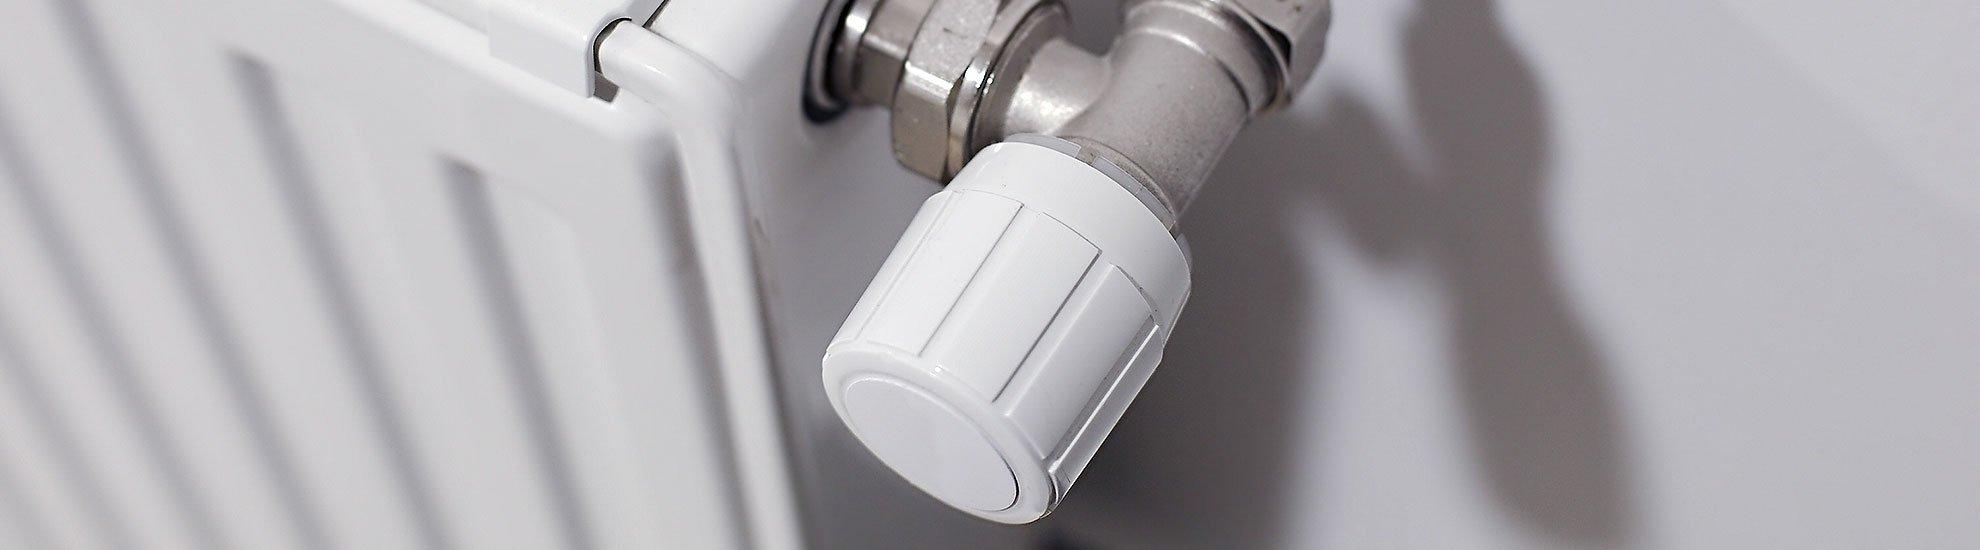 Bathroom heating service